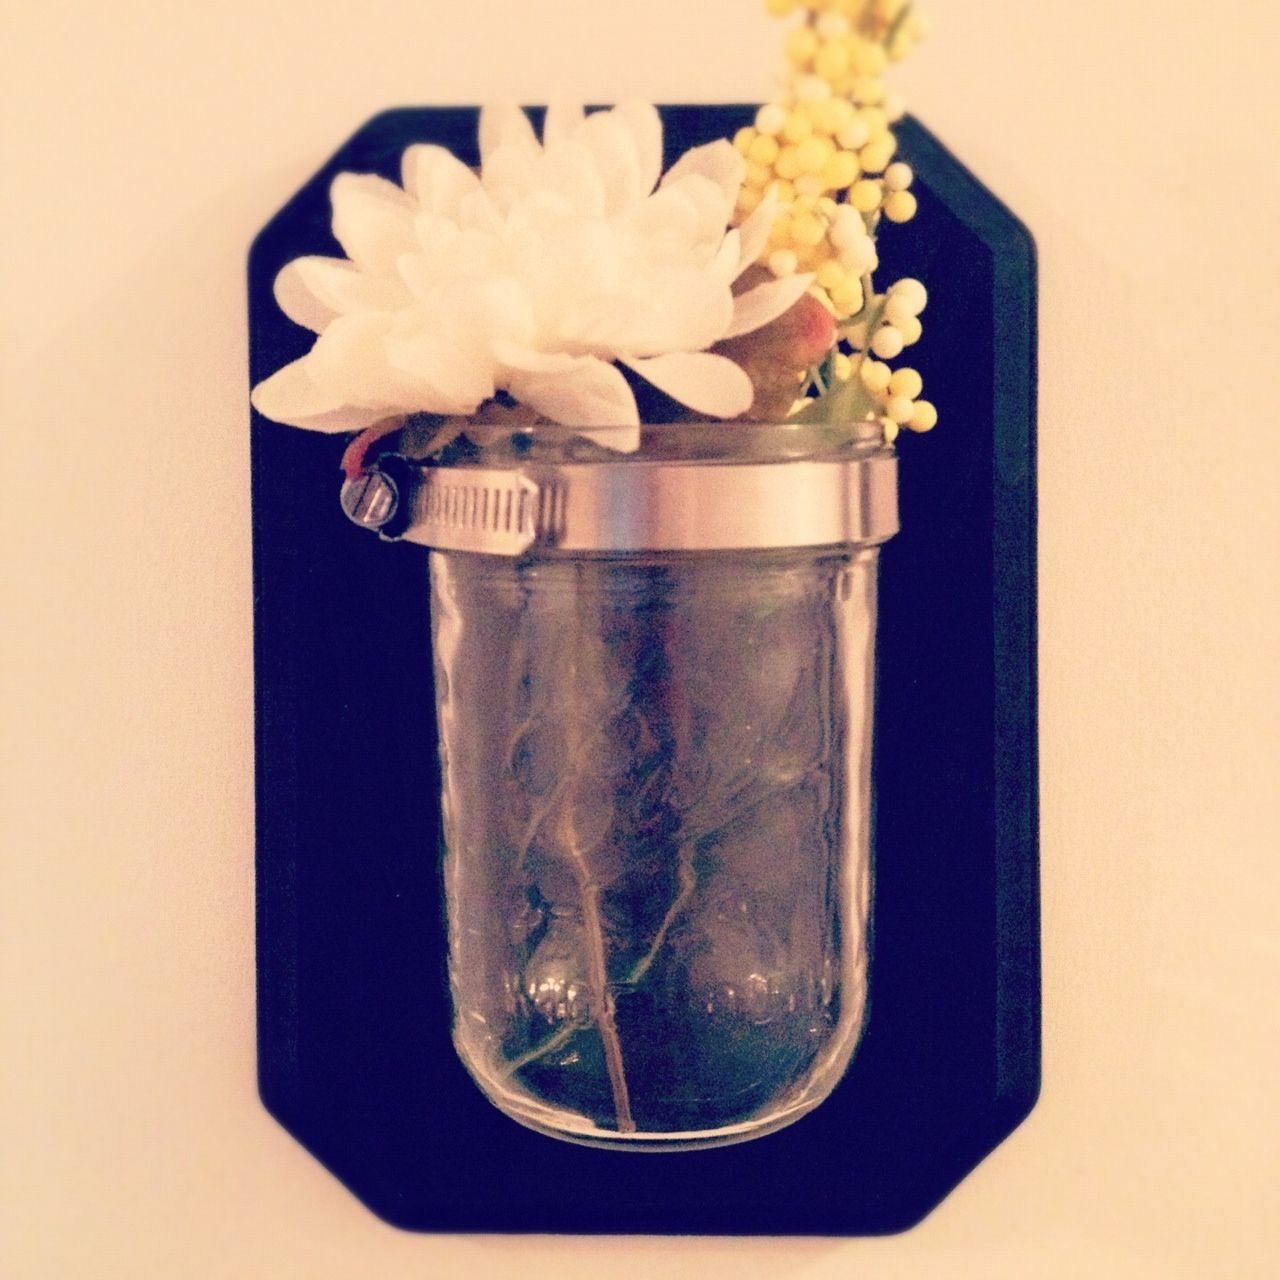 Diy Mason Jar Wall Sconces : DIY Mason Jar Sconce Made By Me Pinterest Mason jar sconce